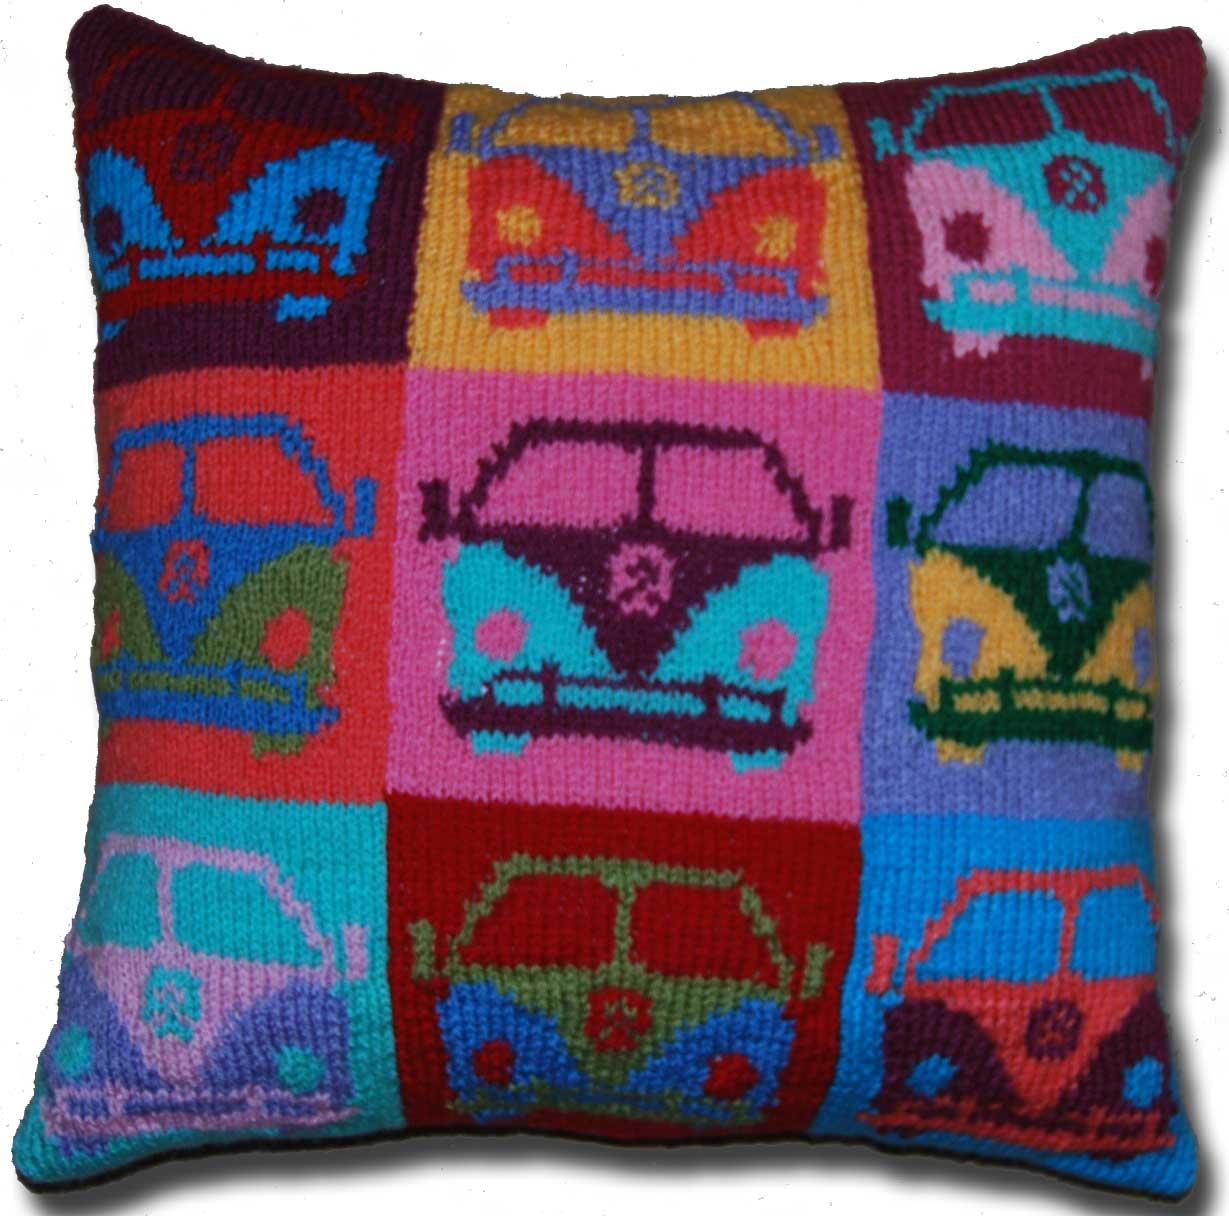 Pop Art Campervan Cushion PDF Knitting Pattern - Slightly Sheepish